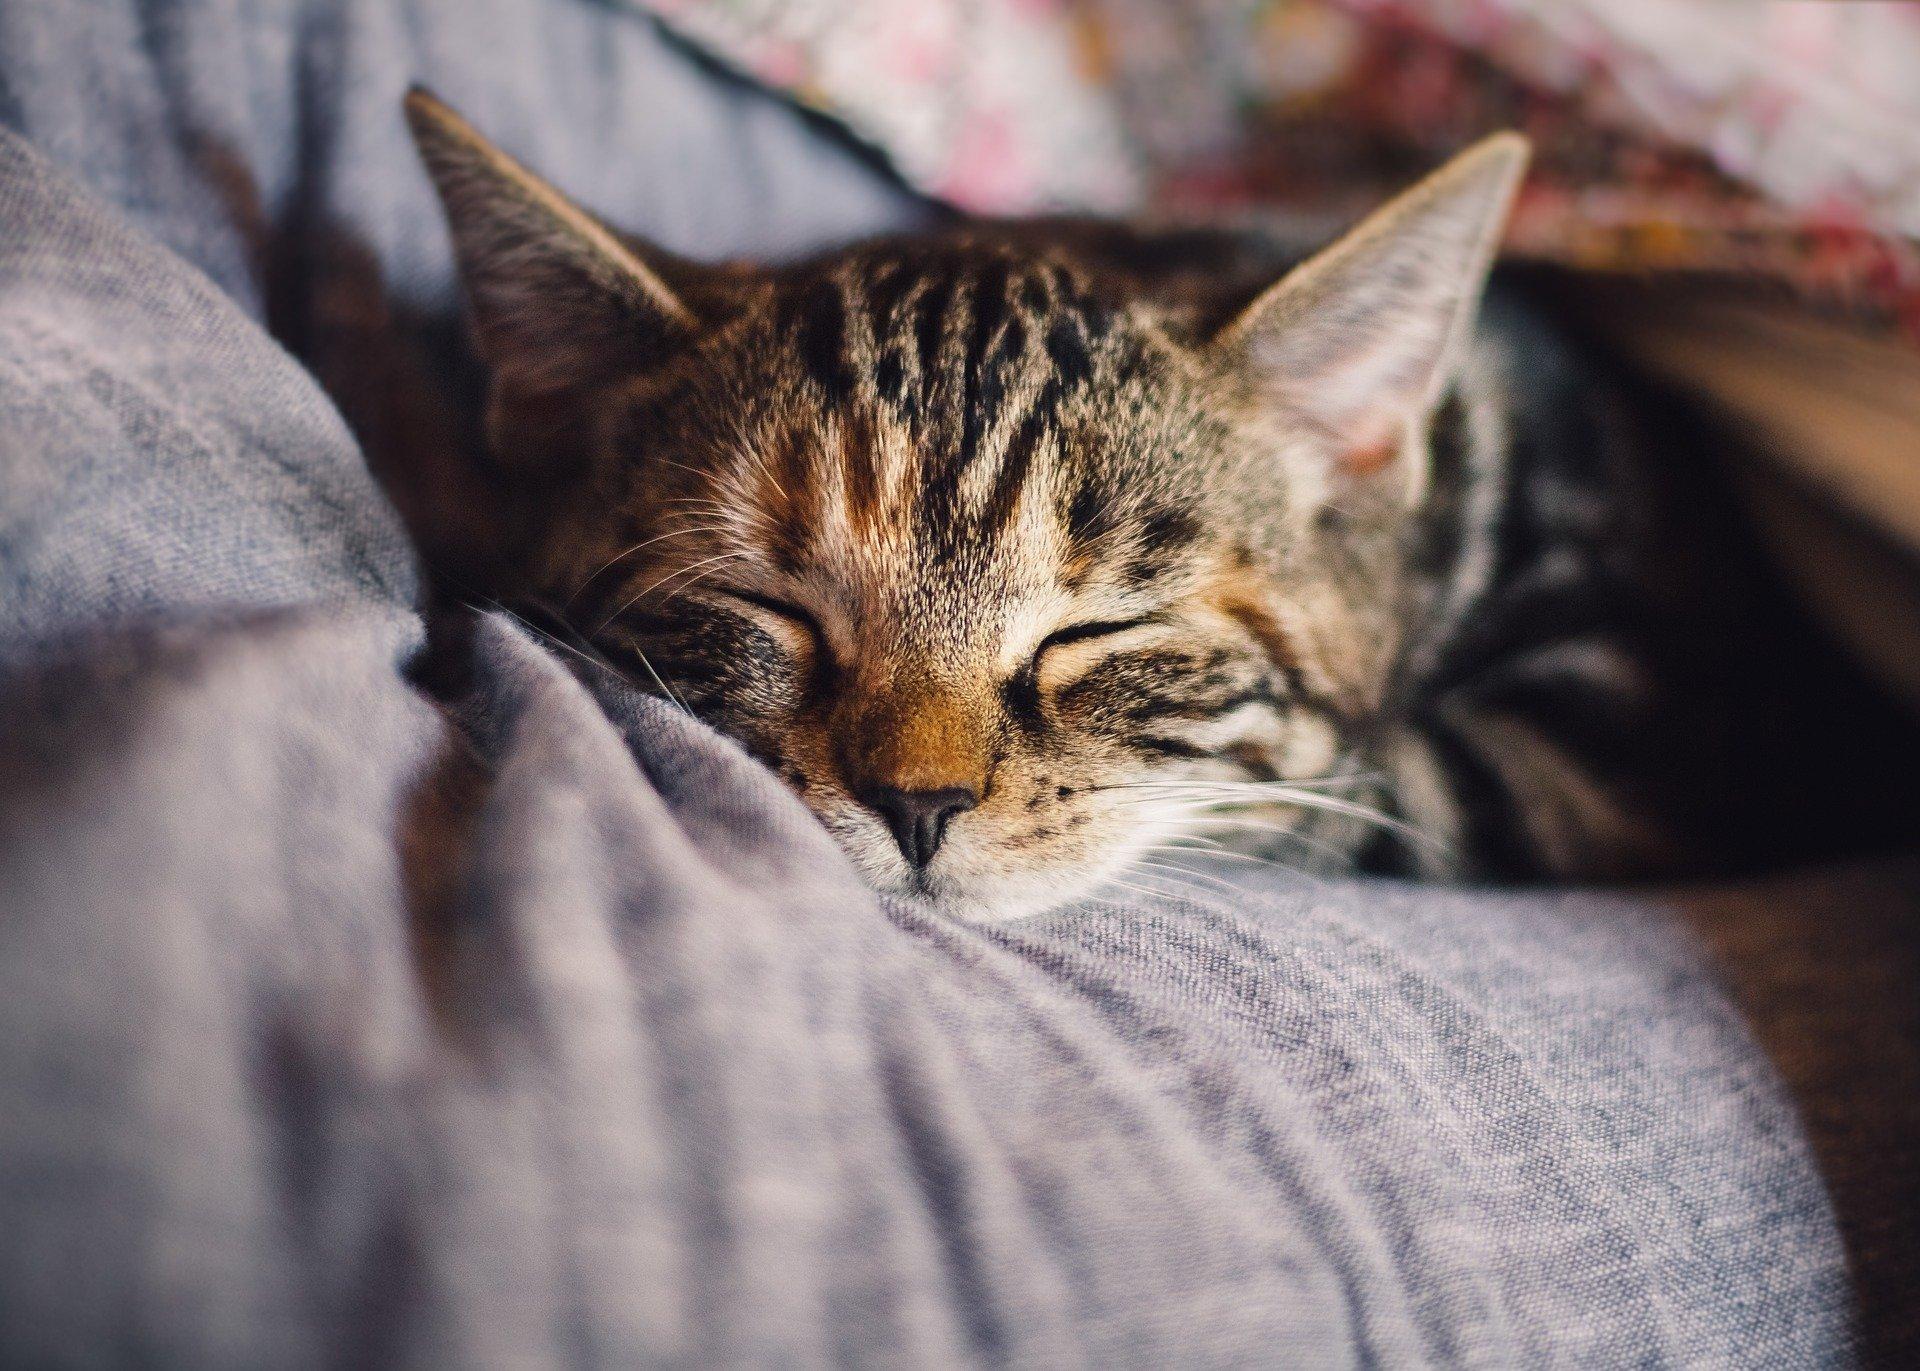 Son muchas las causas de la muerte súbita en gatos